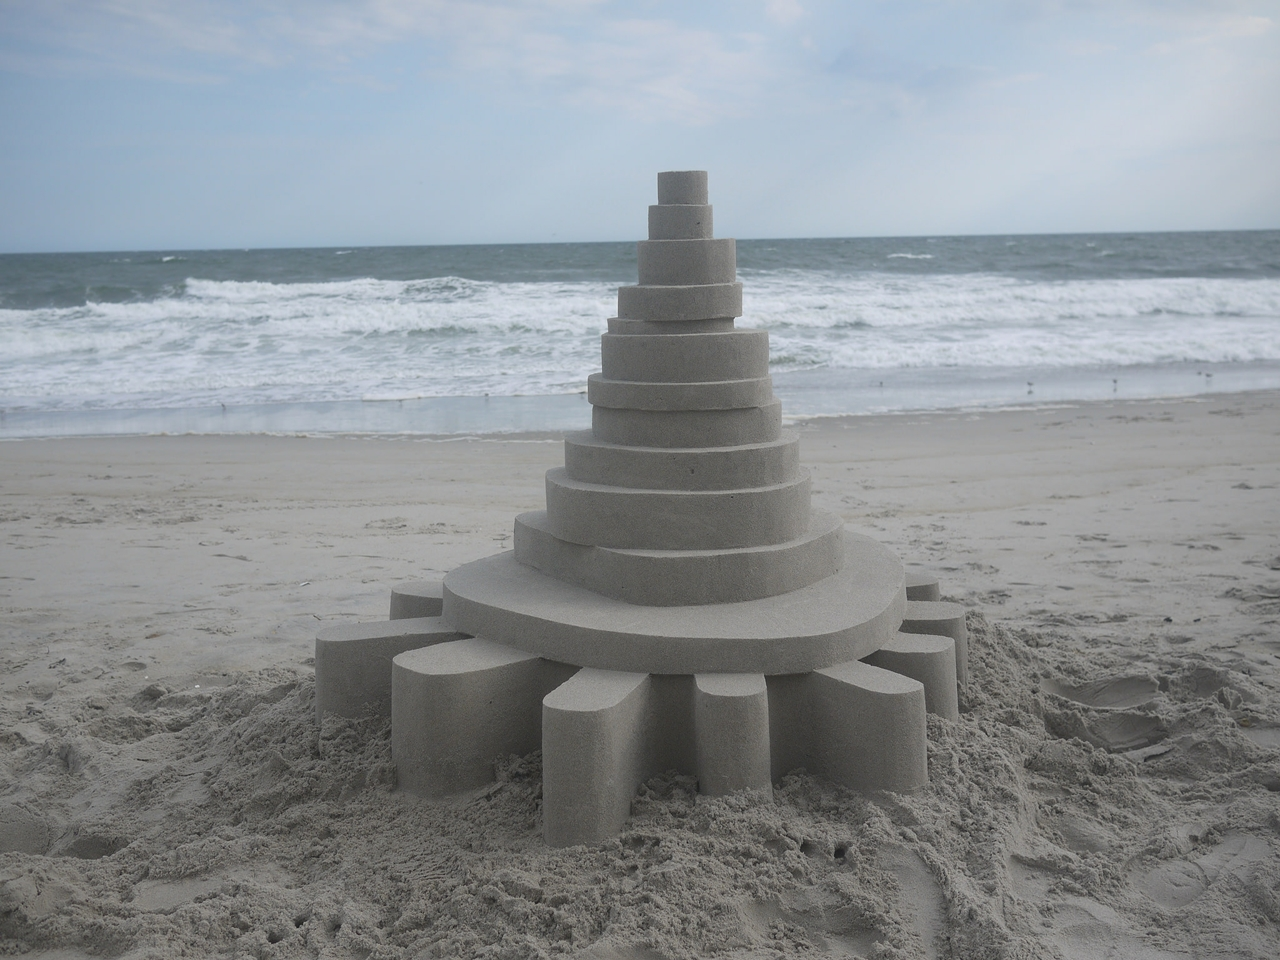 sand-castles-04